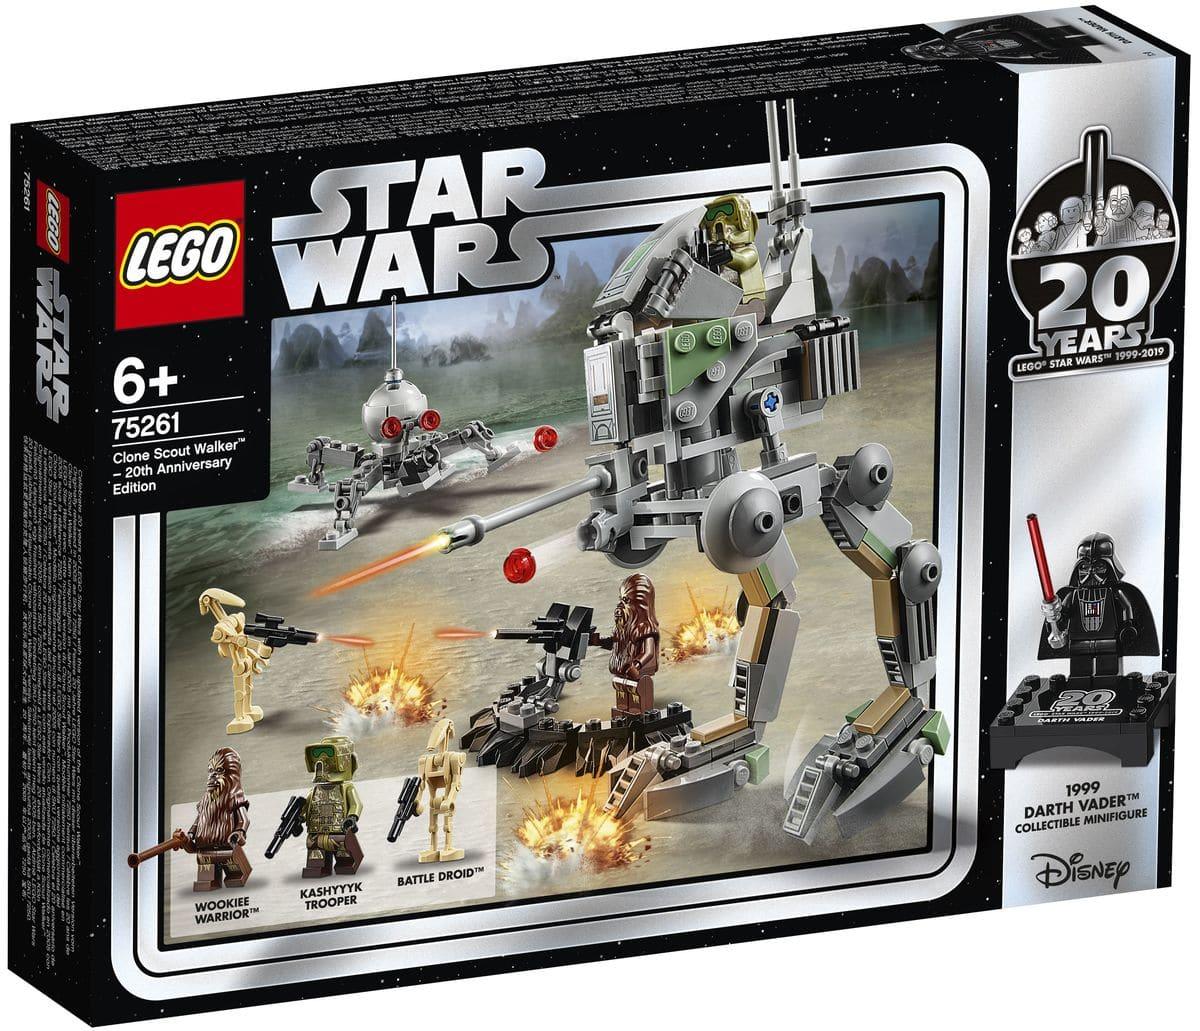 LEGO Star Wars April 2019: Alle Sets ab jetzt verfügbar!